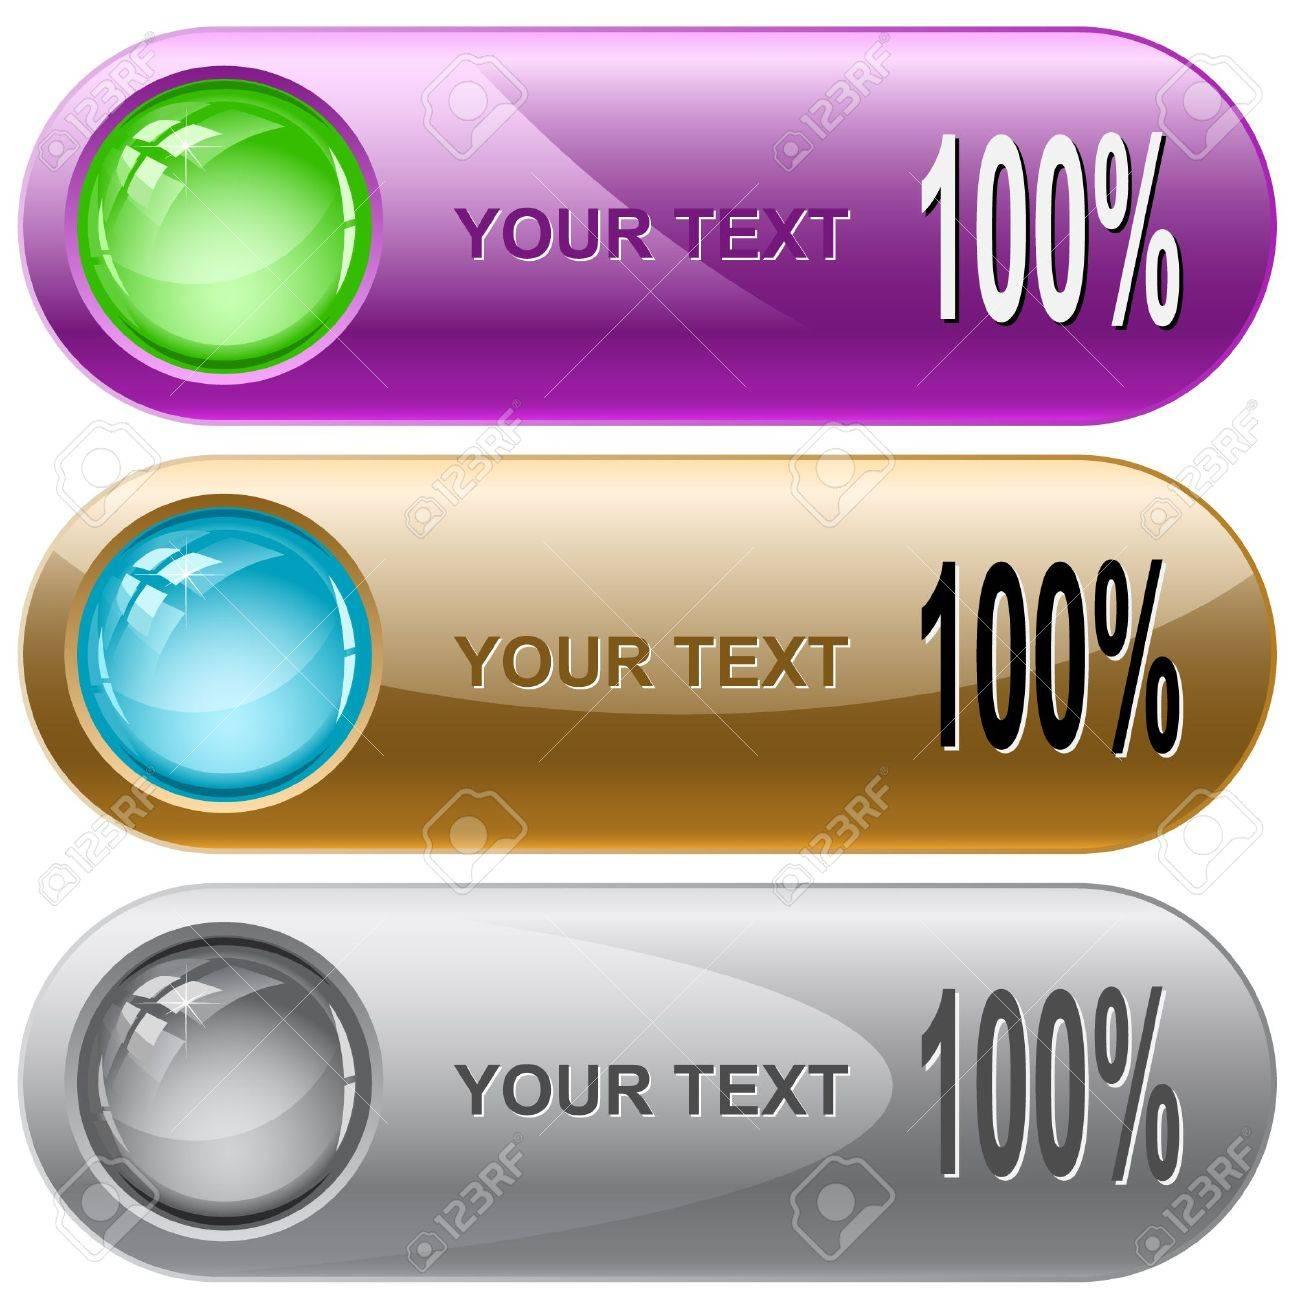 100%. Vector internet buttons. Stock Vector - 6846781